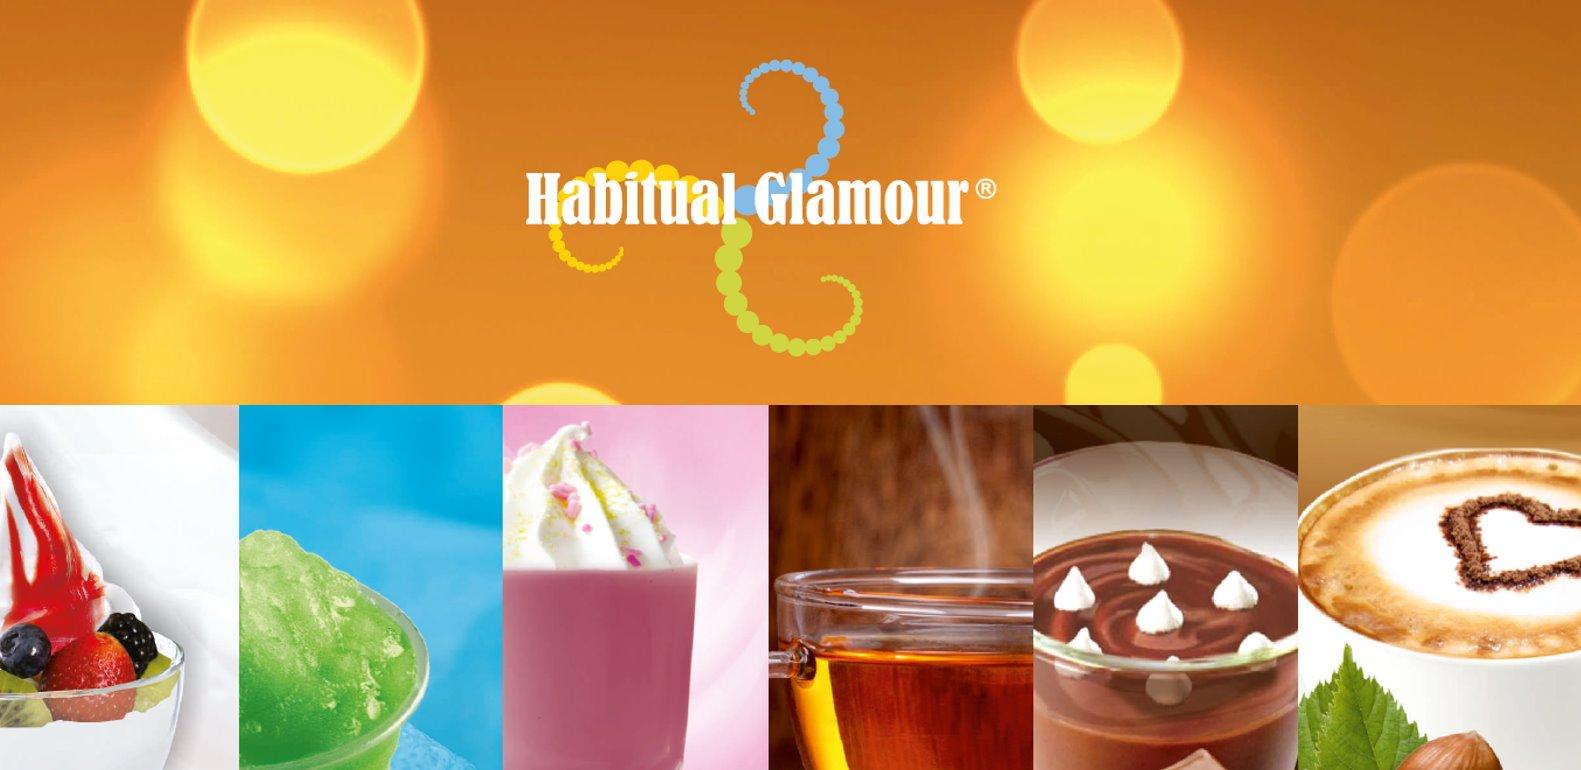 Habitual Glamour